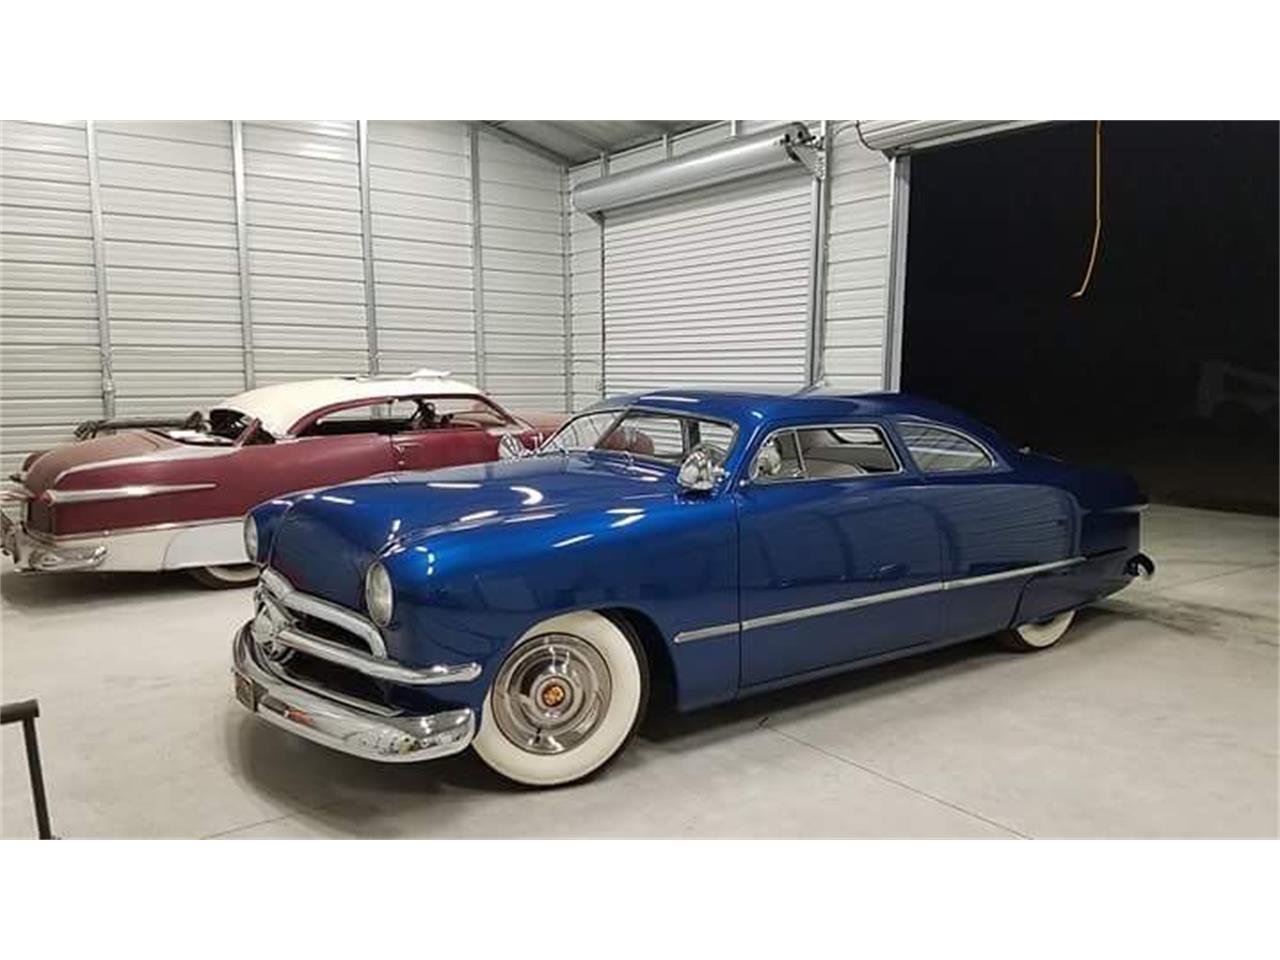 Large Picture of Classic 1950 Tudor located in Temecula  California - $58,000.00 - PZ3K